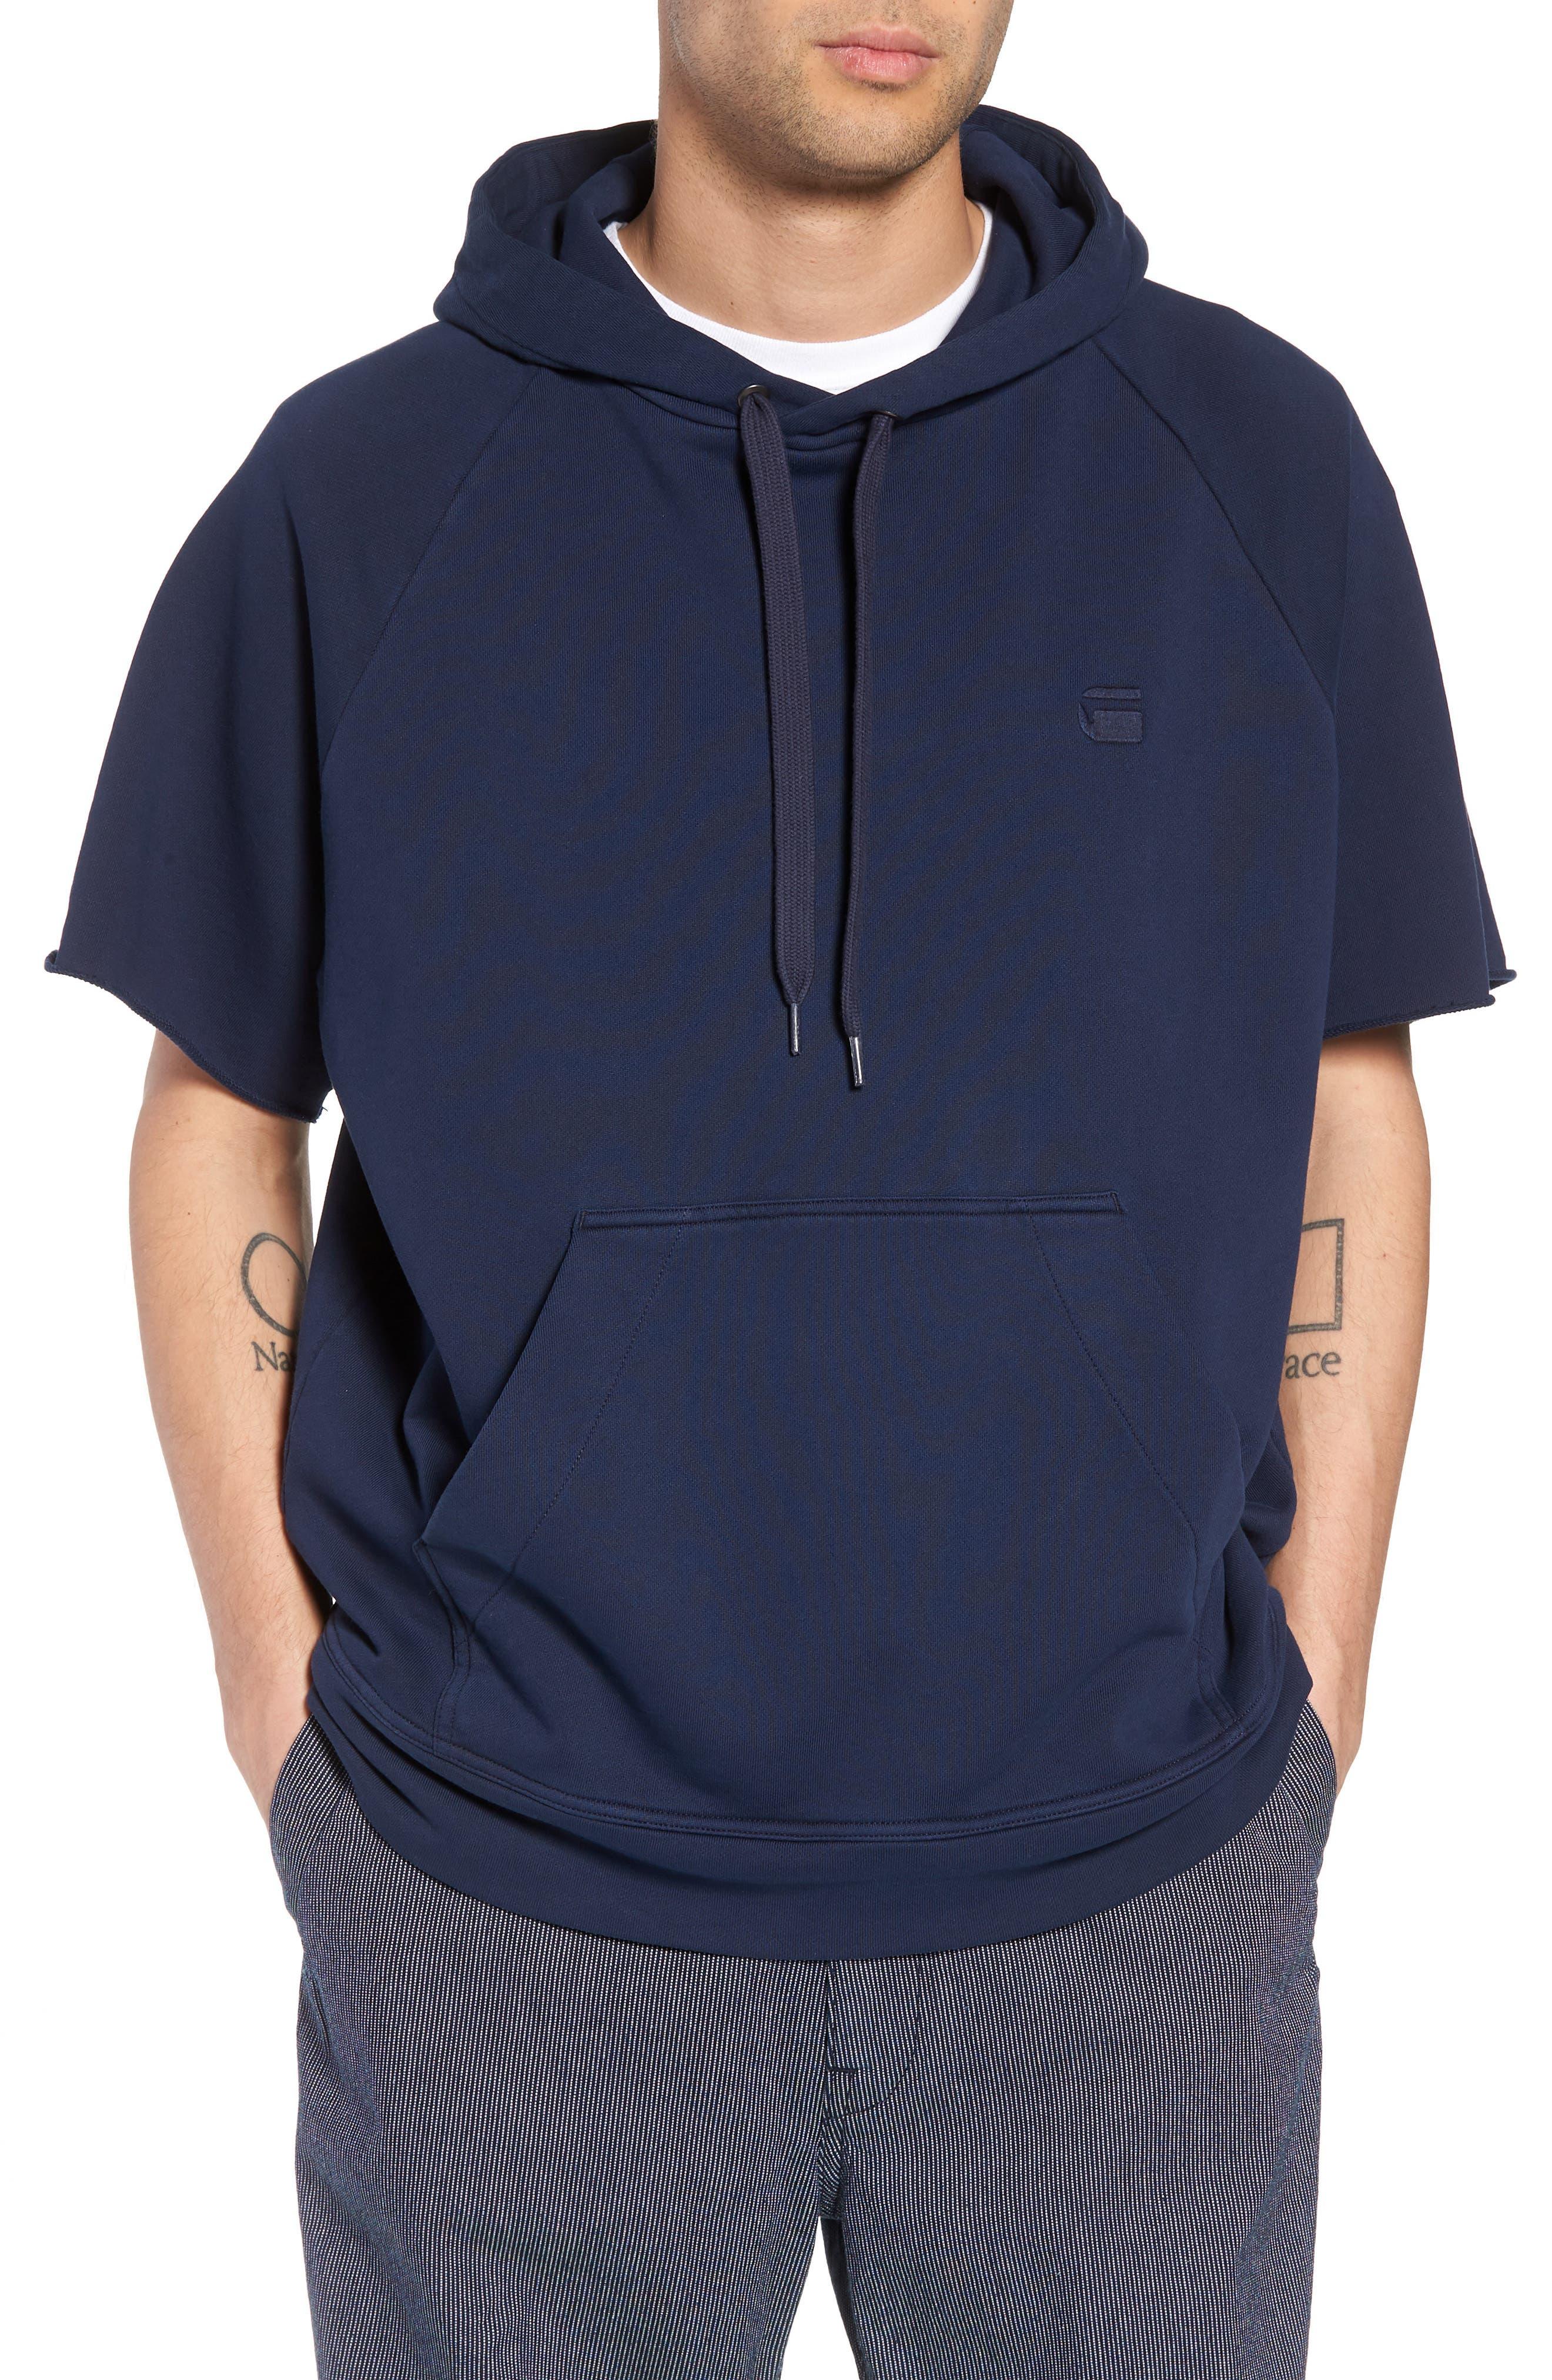 G-Star Raw Tendric Half-Sleeve Hoodie Sweatshirt